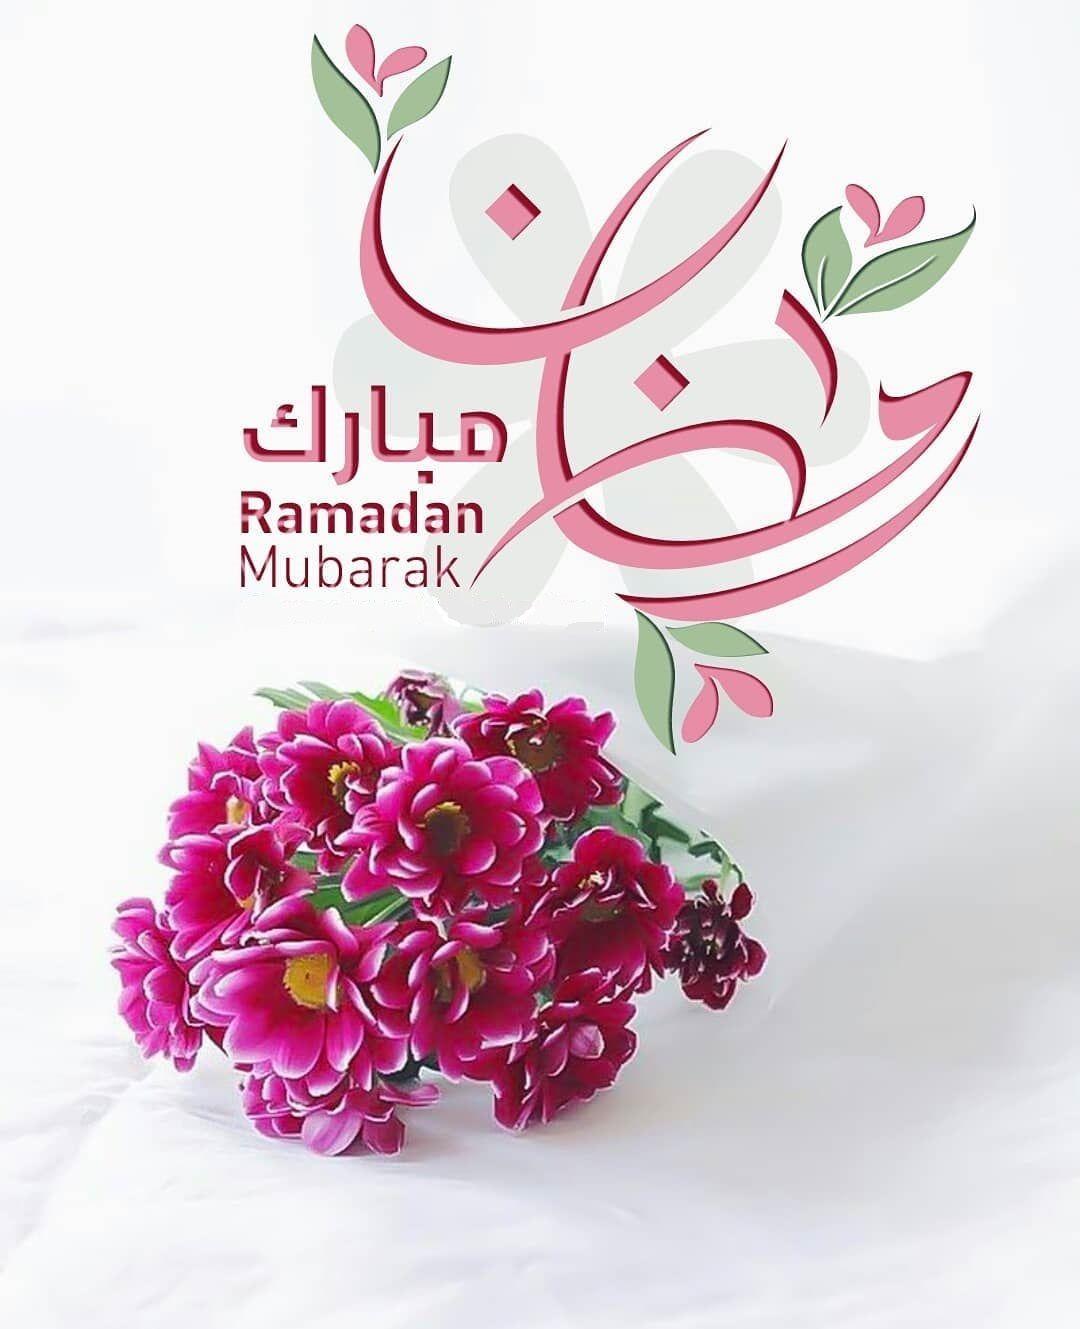 Desertrose أسأل الله في شهر رمضان المبارك أن يتوج أيامنا وأيامكم بقلوب مبتهجة وهموم منفرجة وصح Ramadan Decorations Eid Mubarak Decoration Ramadan Kareem